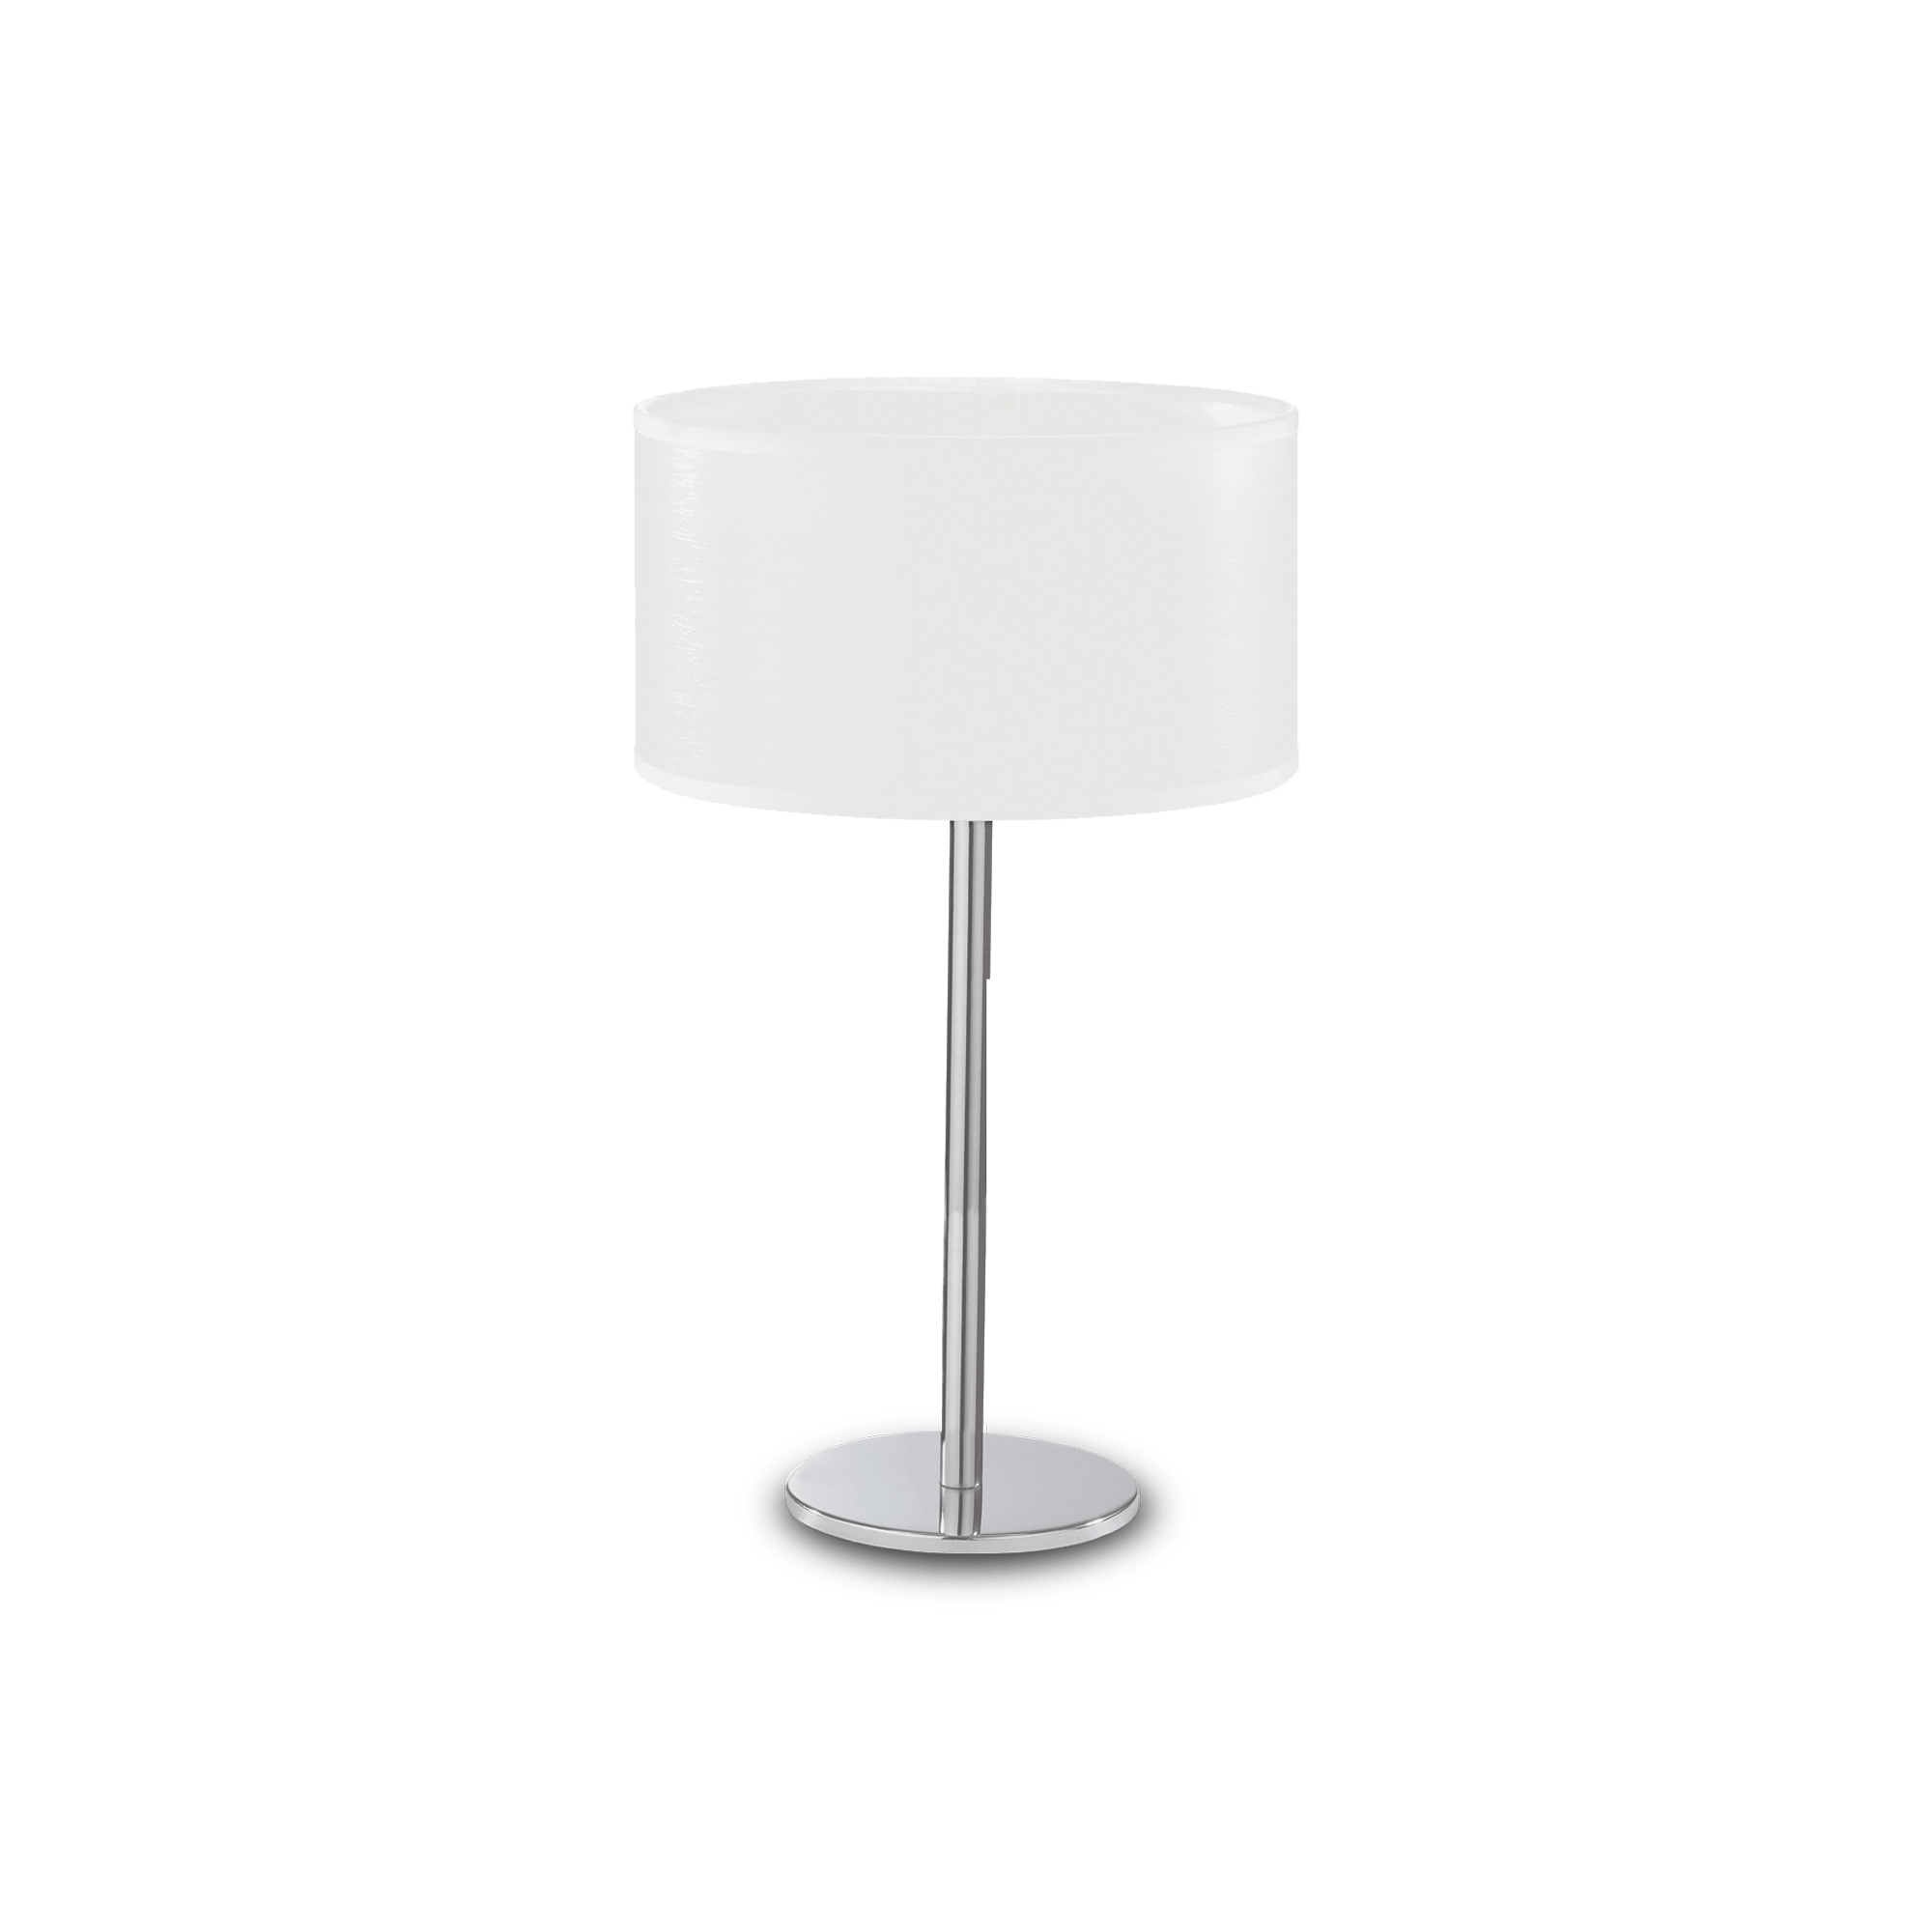 Ideal Lux 143187 WOODY TL1 BIANCO asztali lámpa